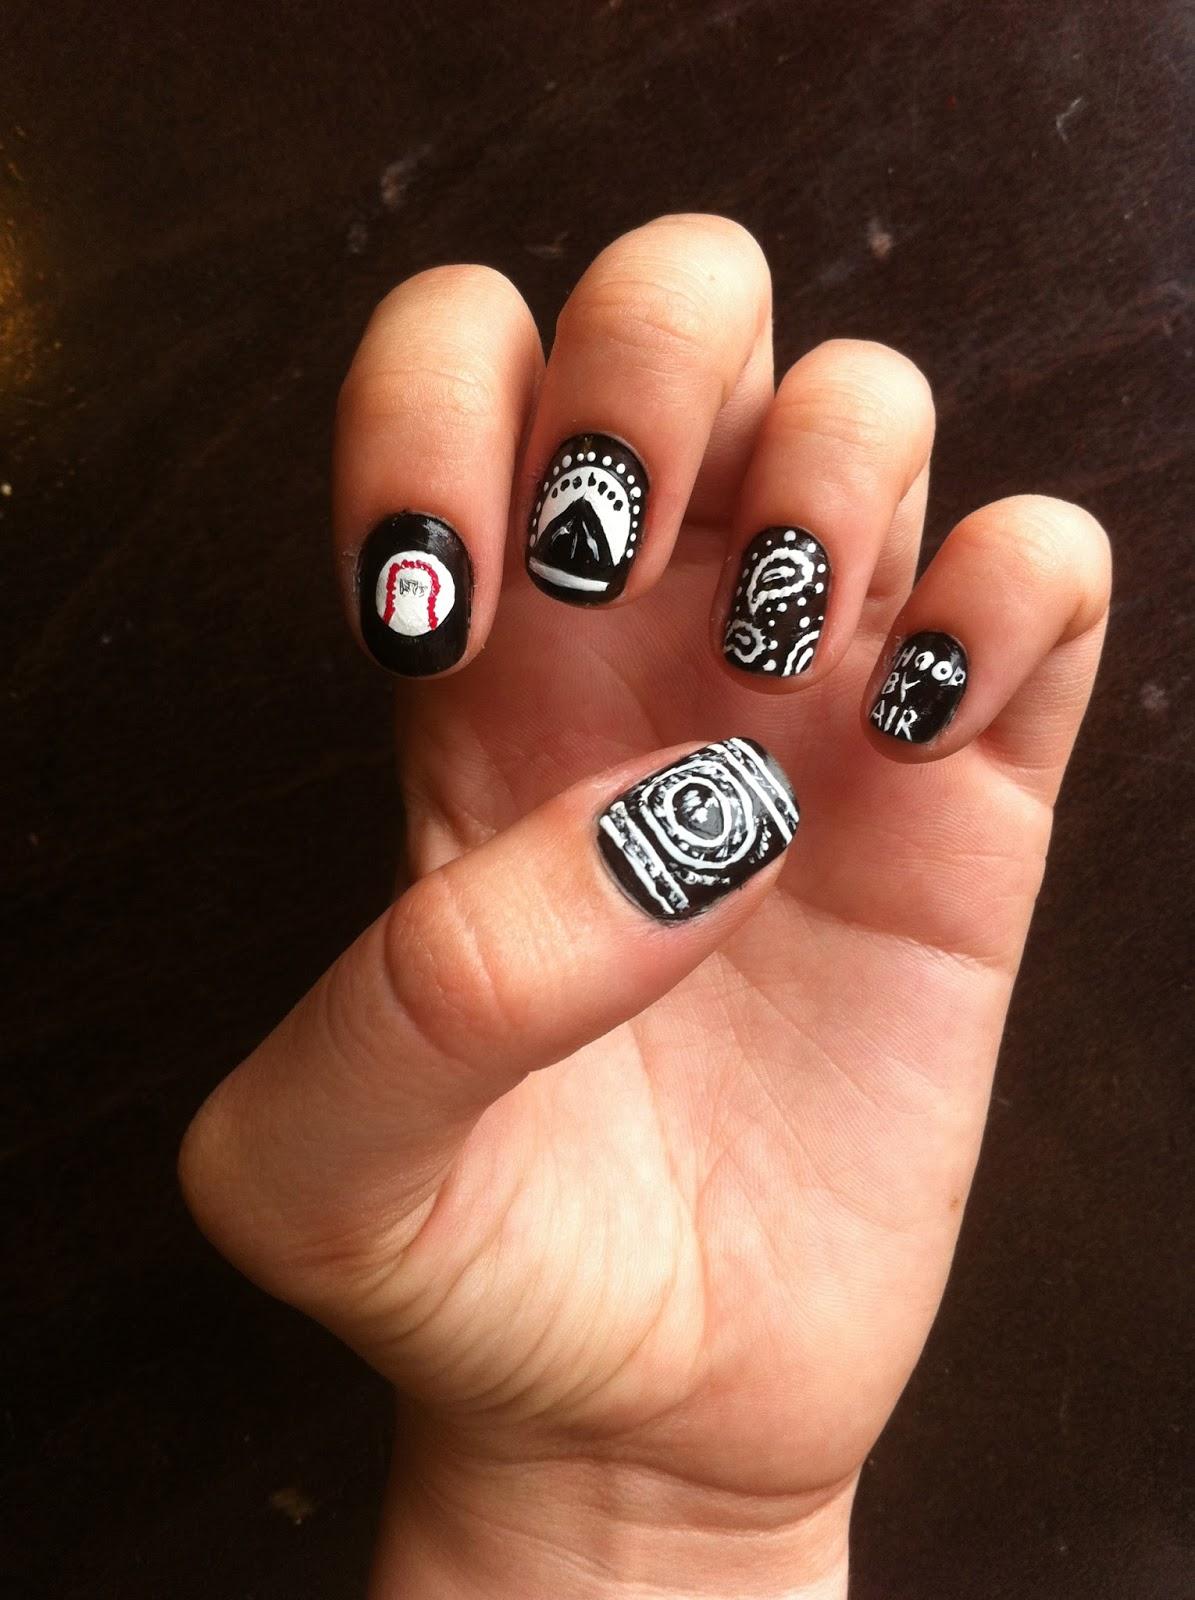 Zetsubou\'s nail art